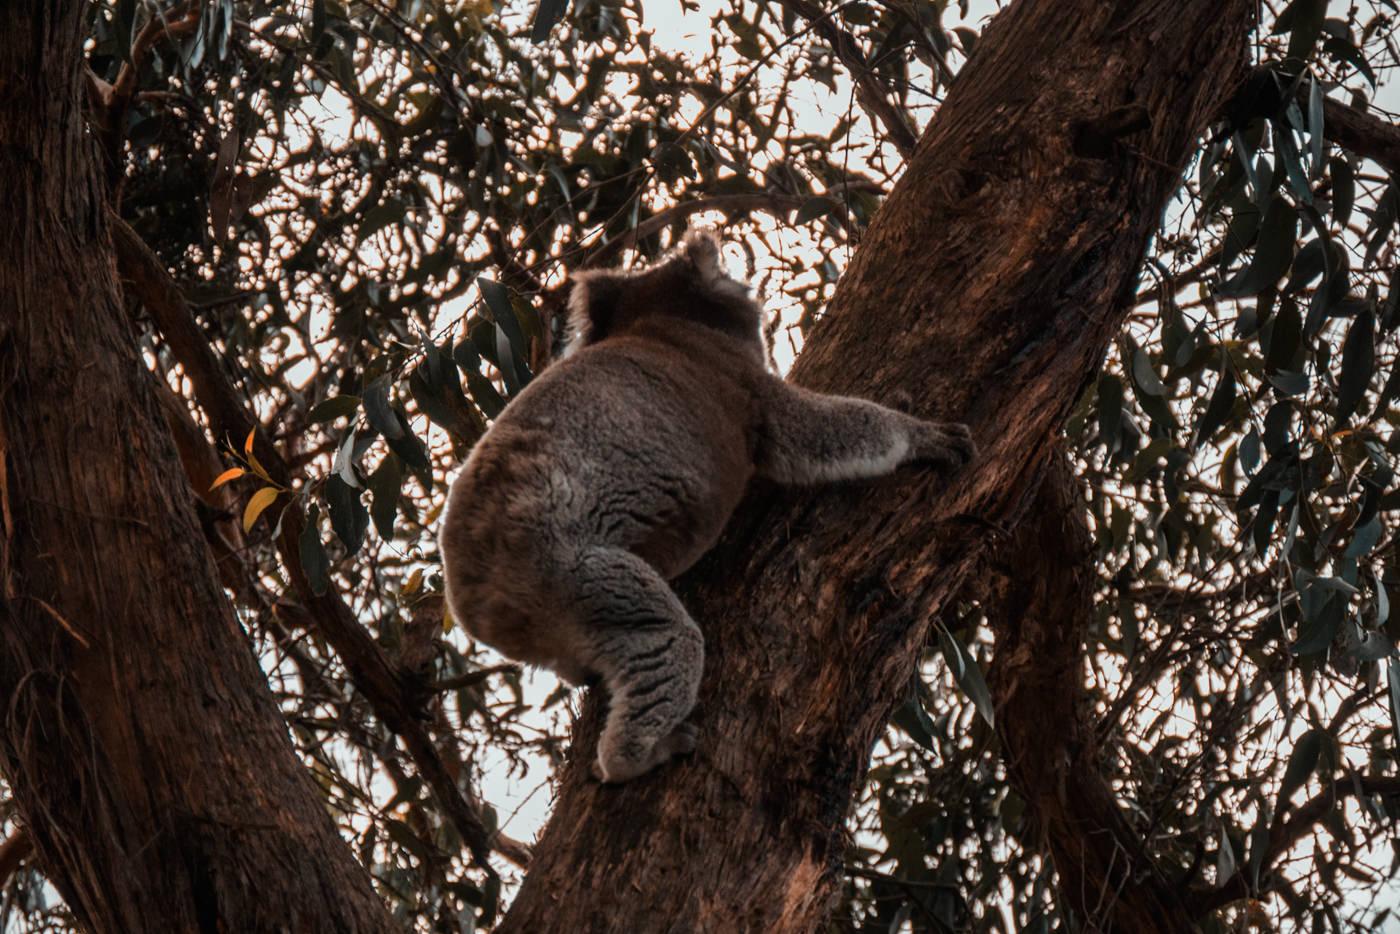 Koala im Baum am Blanket Bay